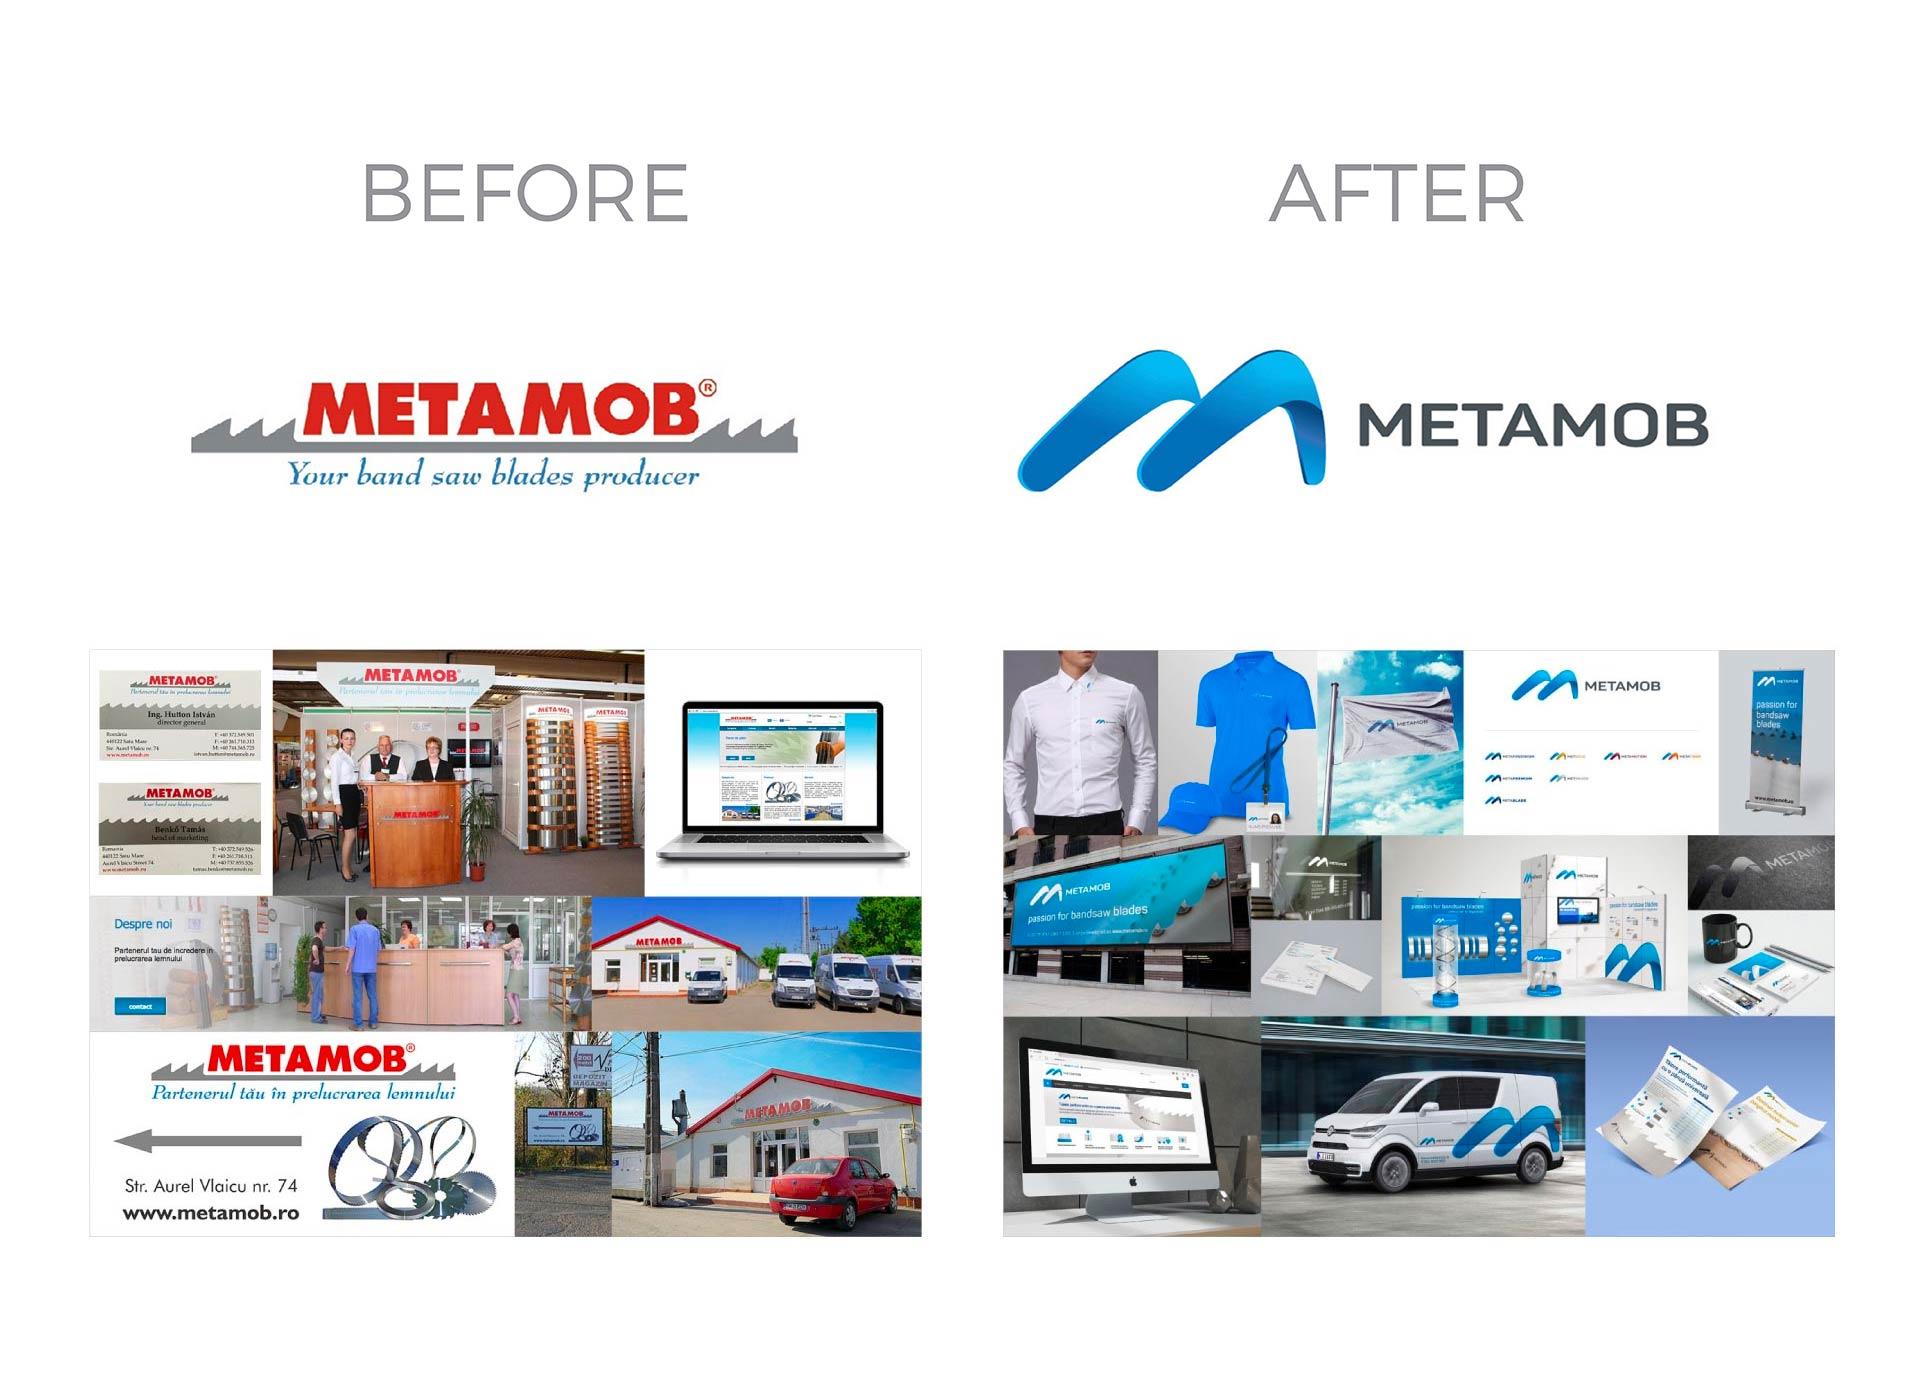 metamob portfolio inoveo before and after rebranding